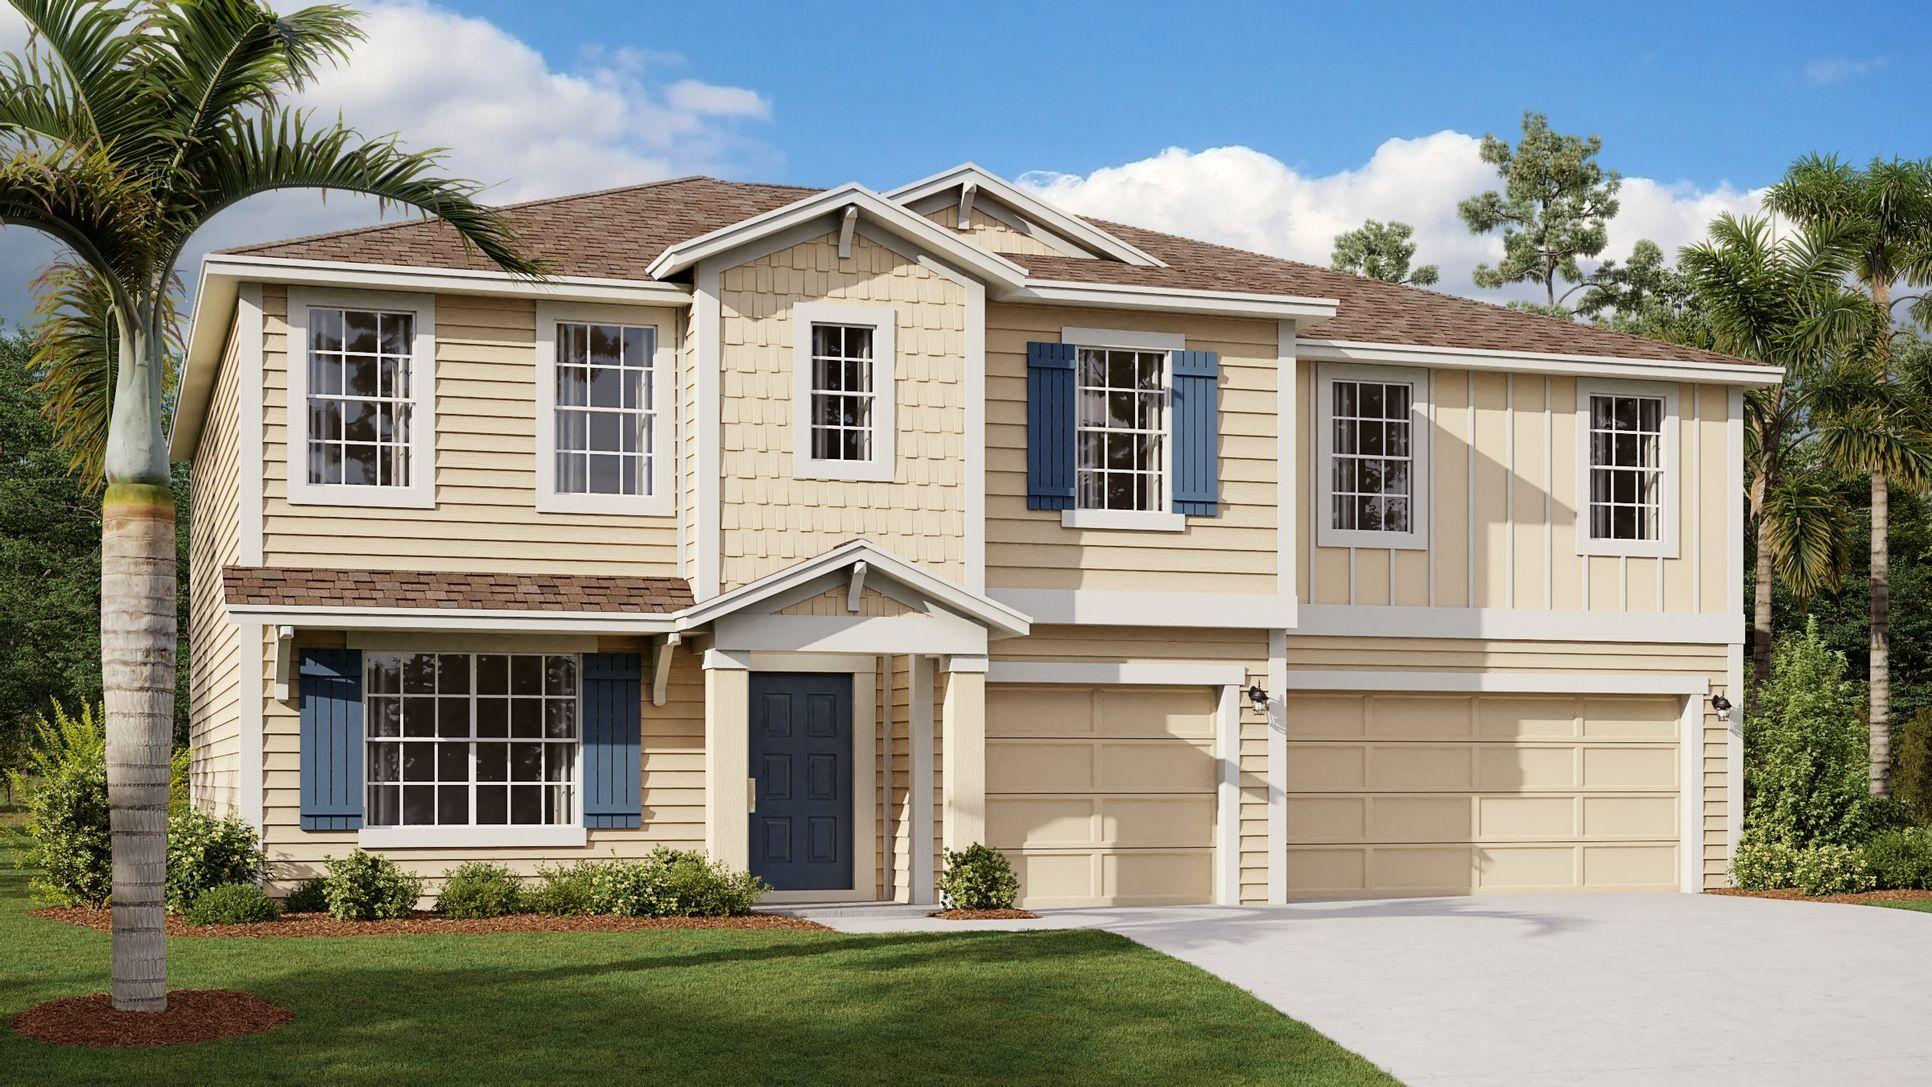 Stoneybrook Hills - Summerhill Estates,32757